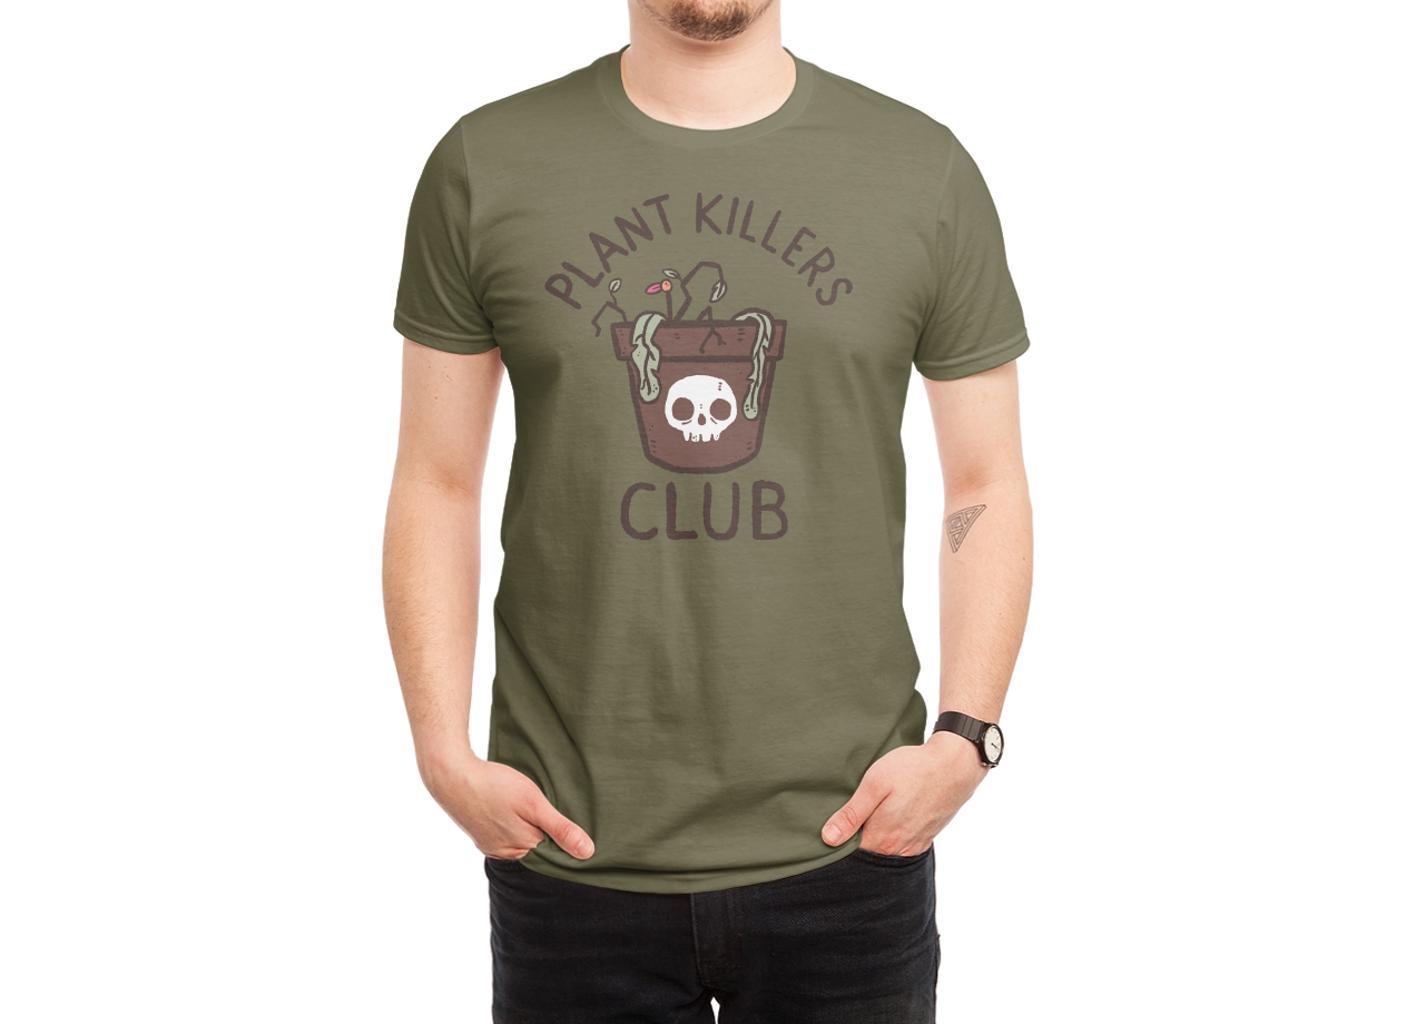 Threadless: Plant Killers Club